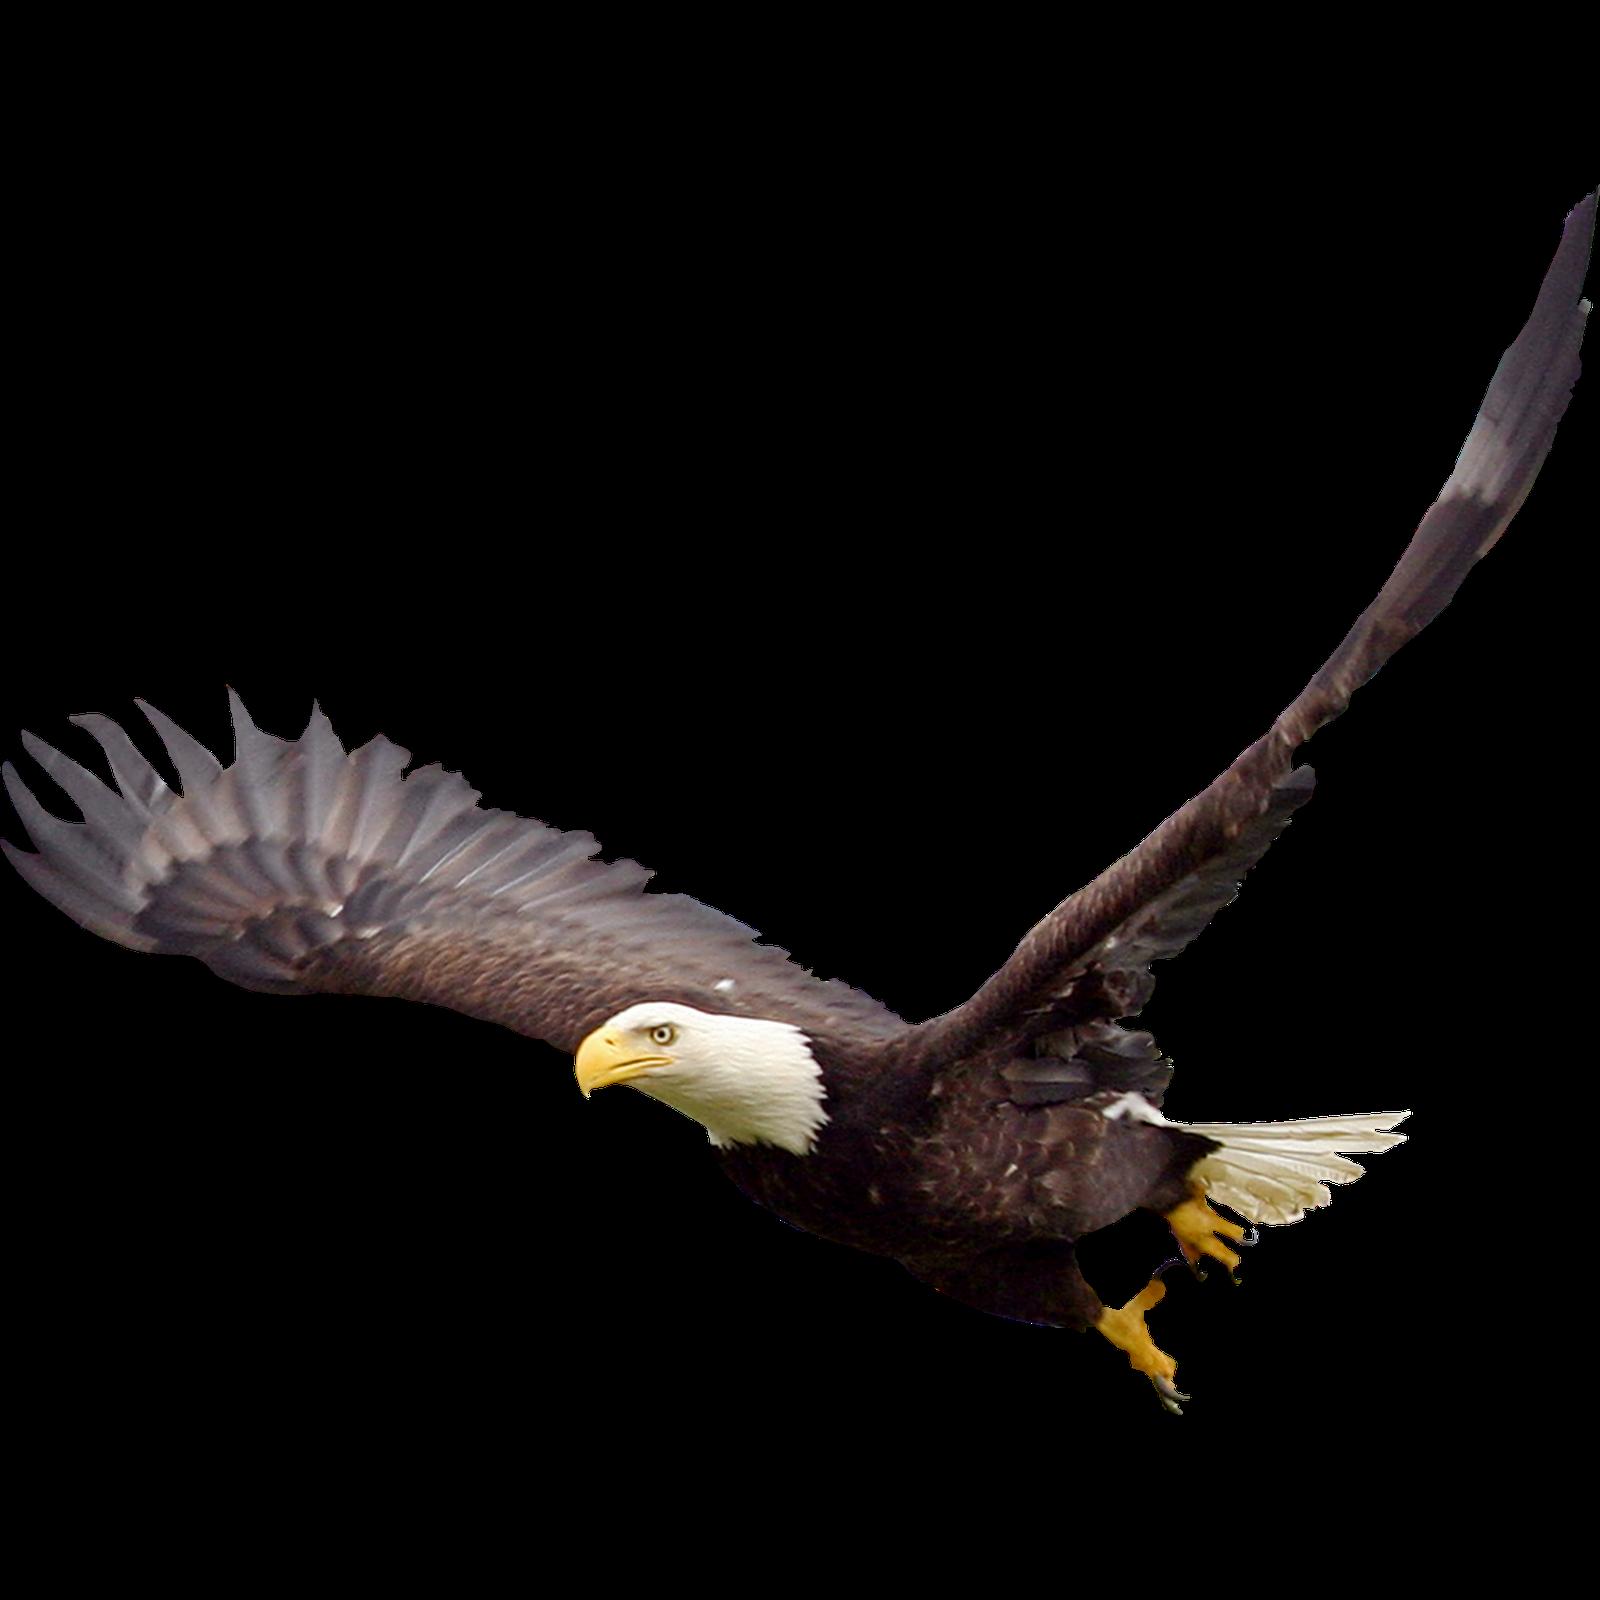 Bald Eagle PNG Image.